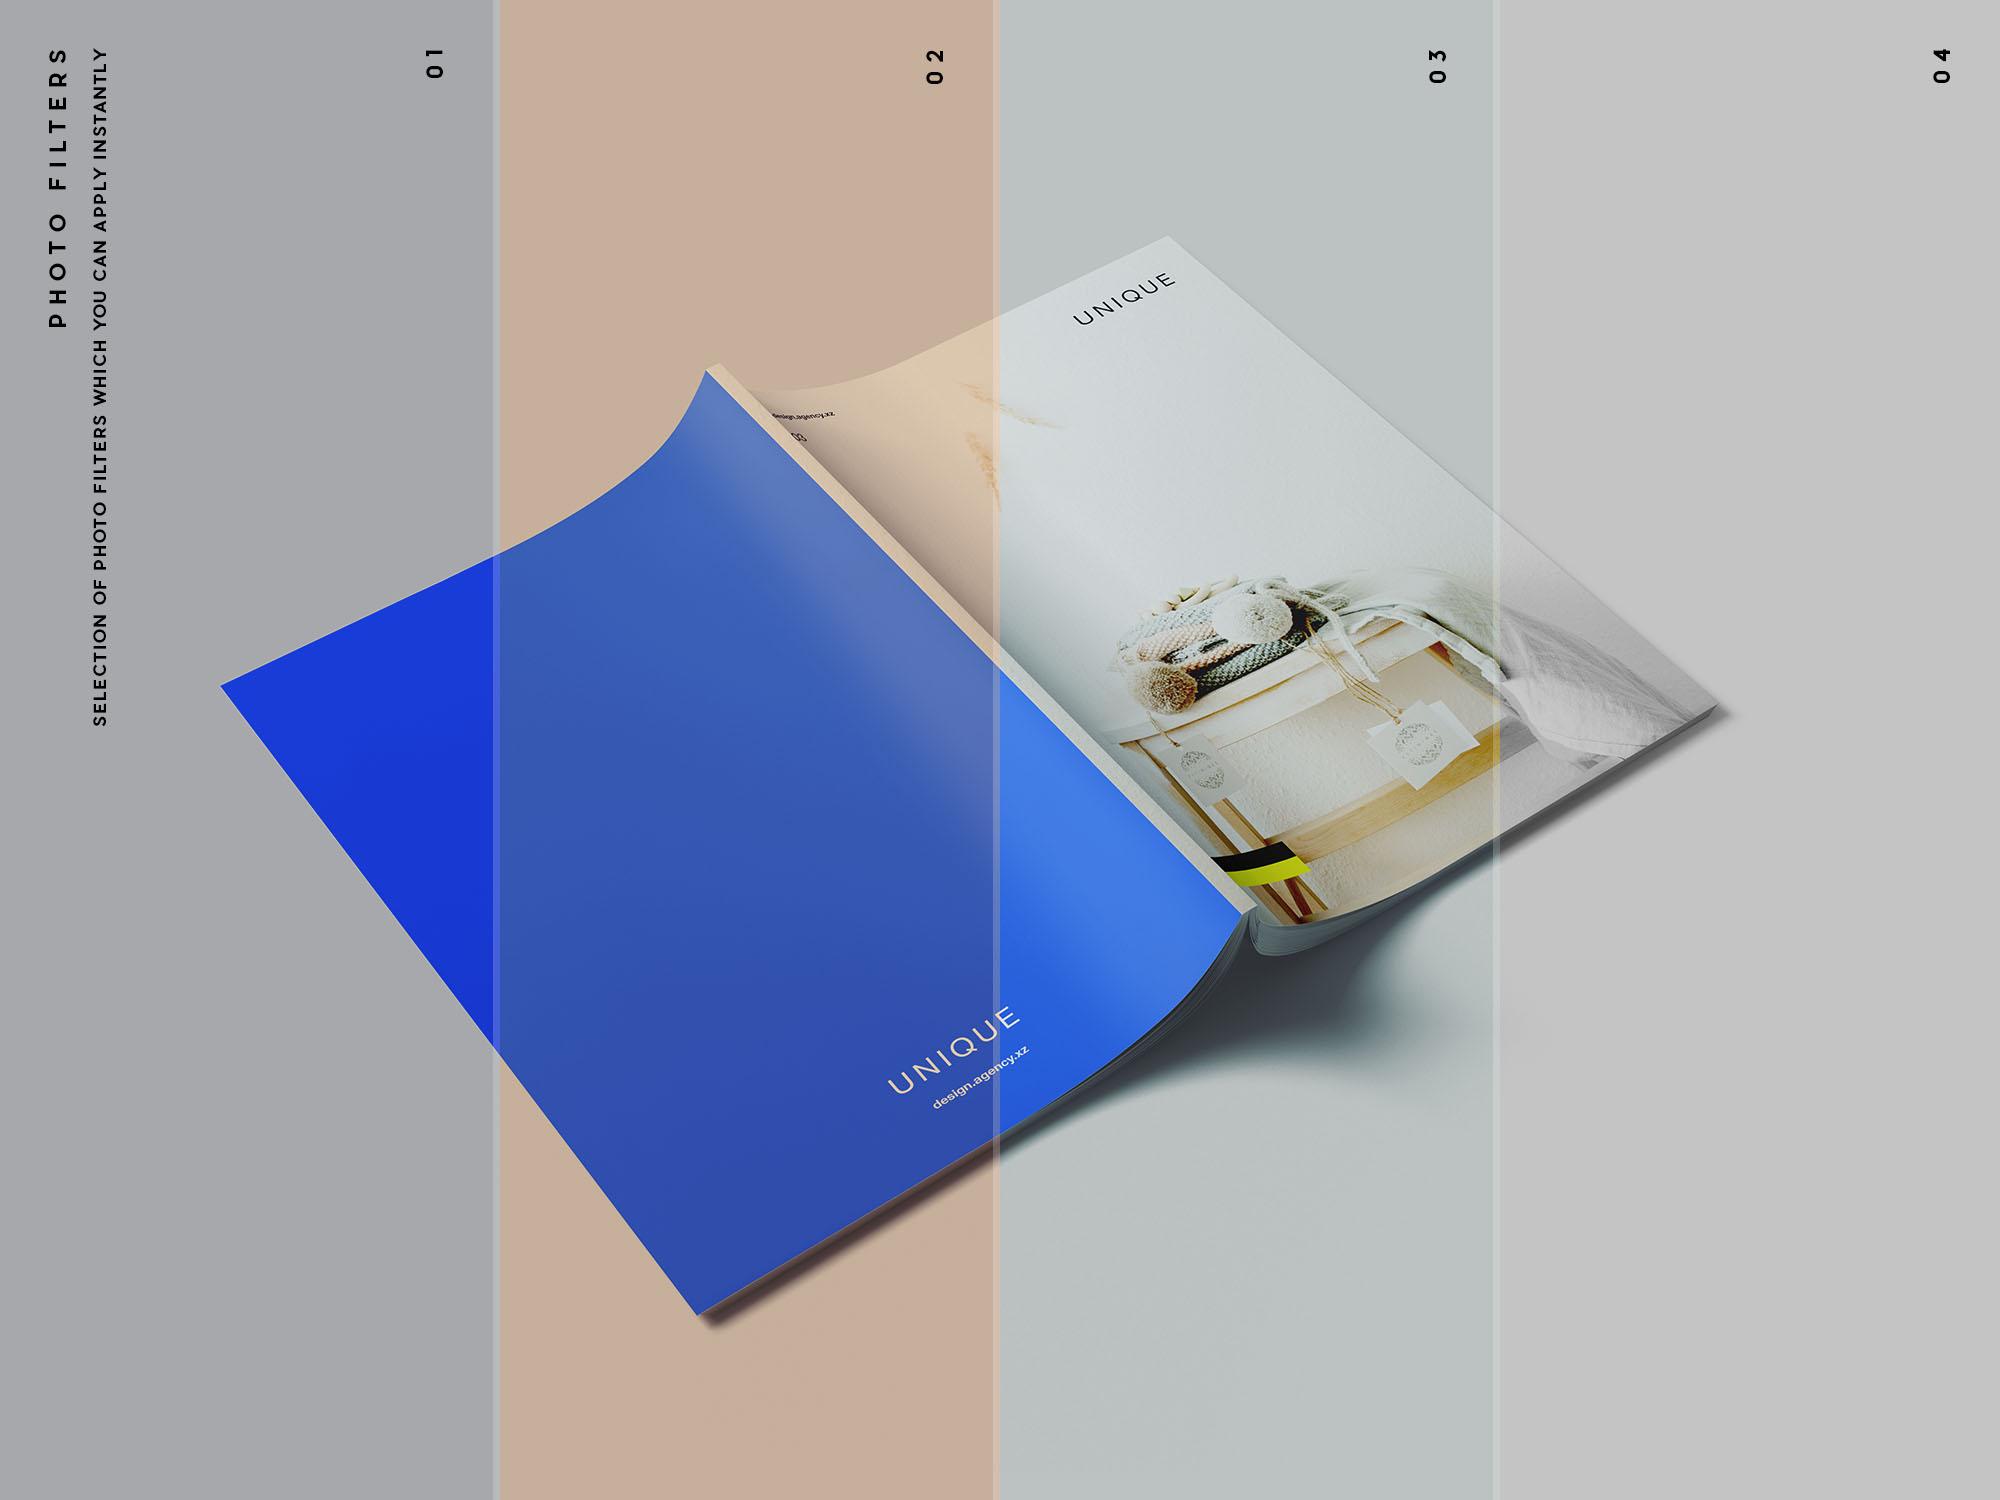 Magazine Mockup - Photo Filters